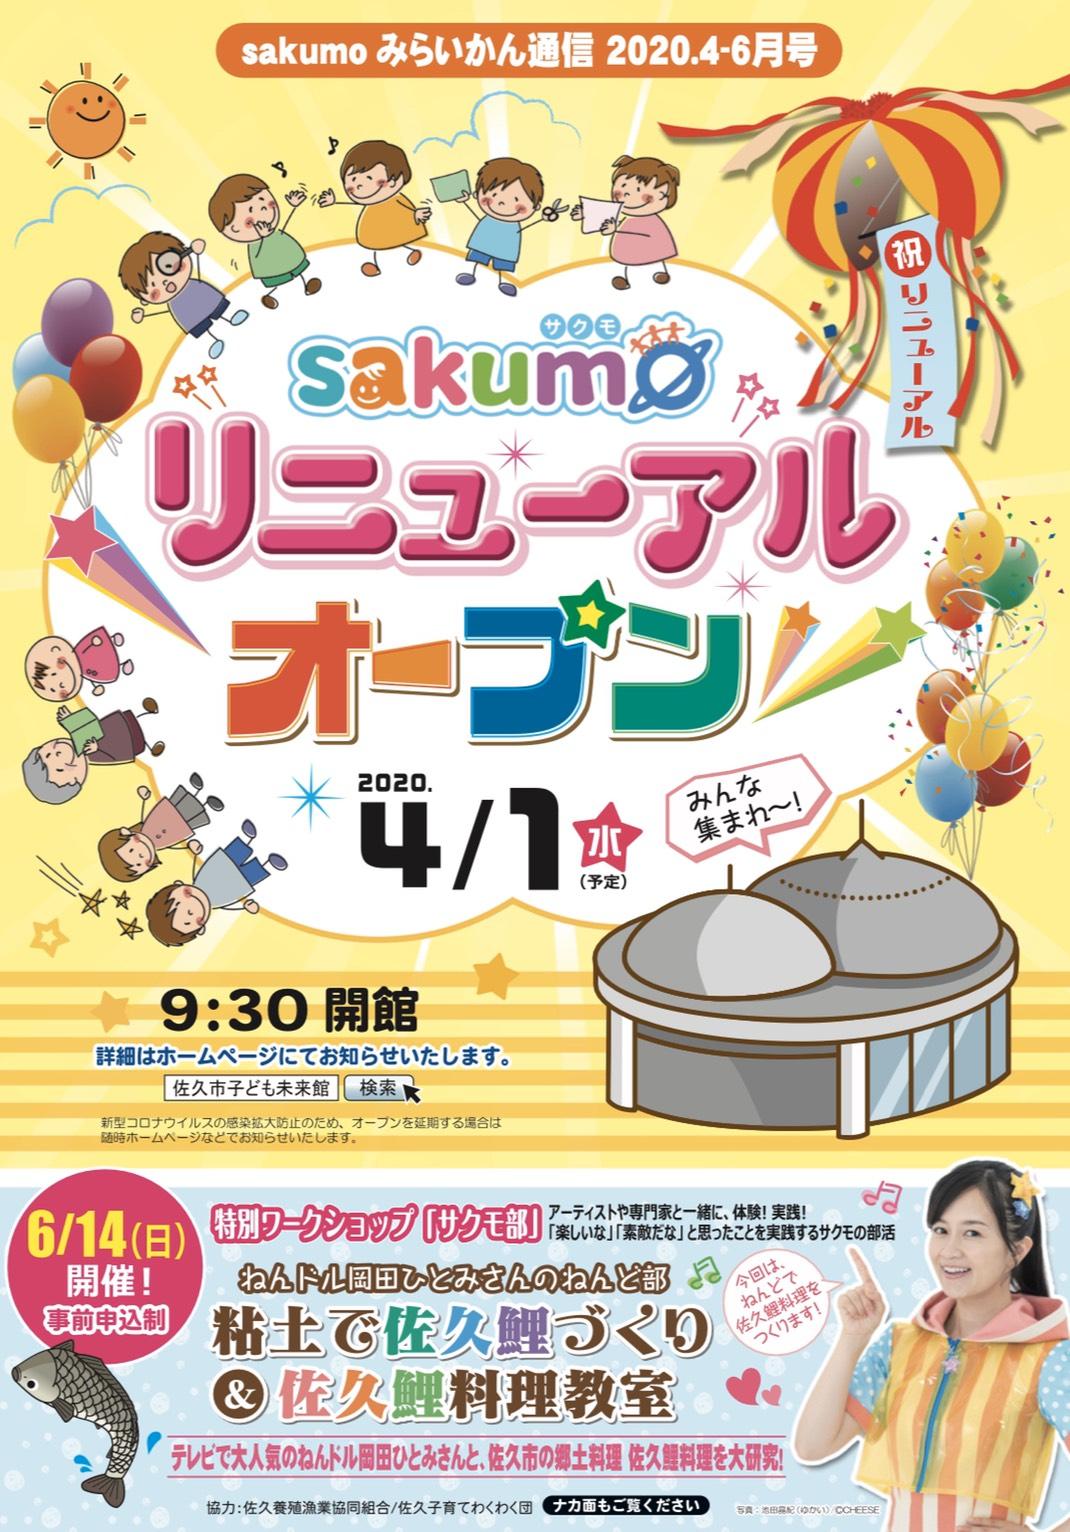 【NEWS】新商品!マジカルドリンクなちゅりんご